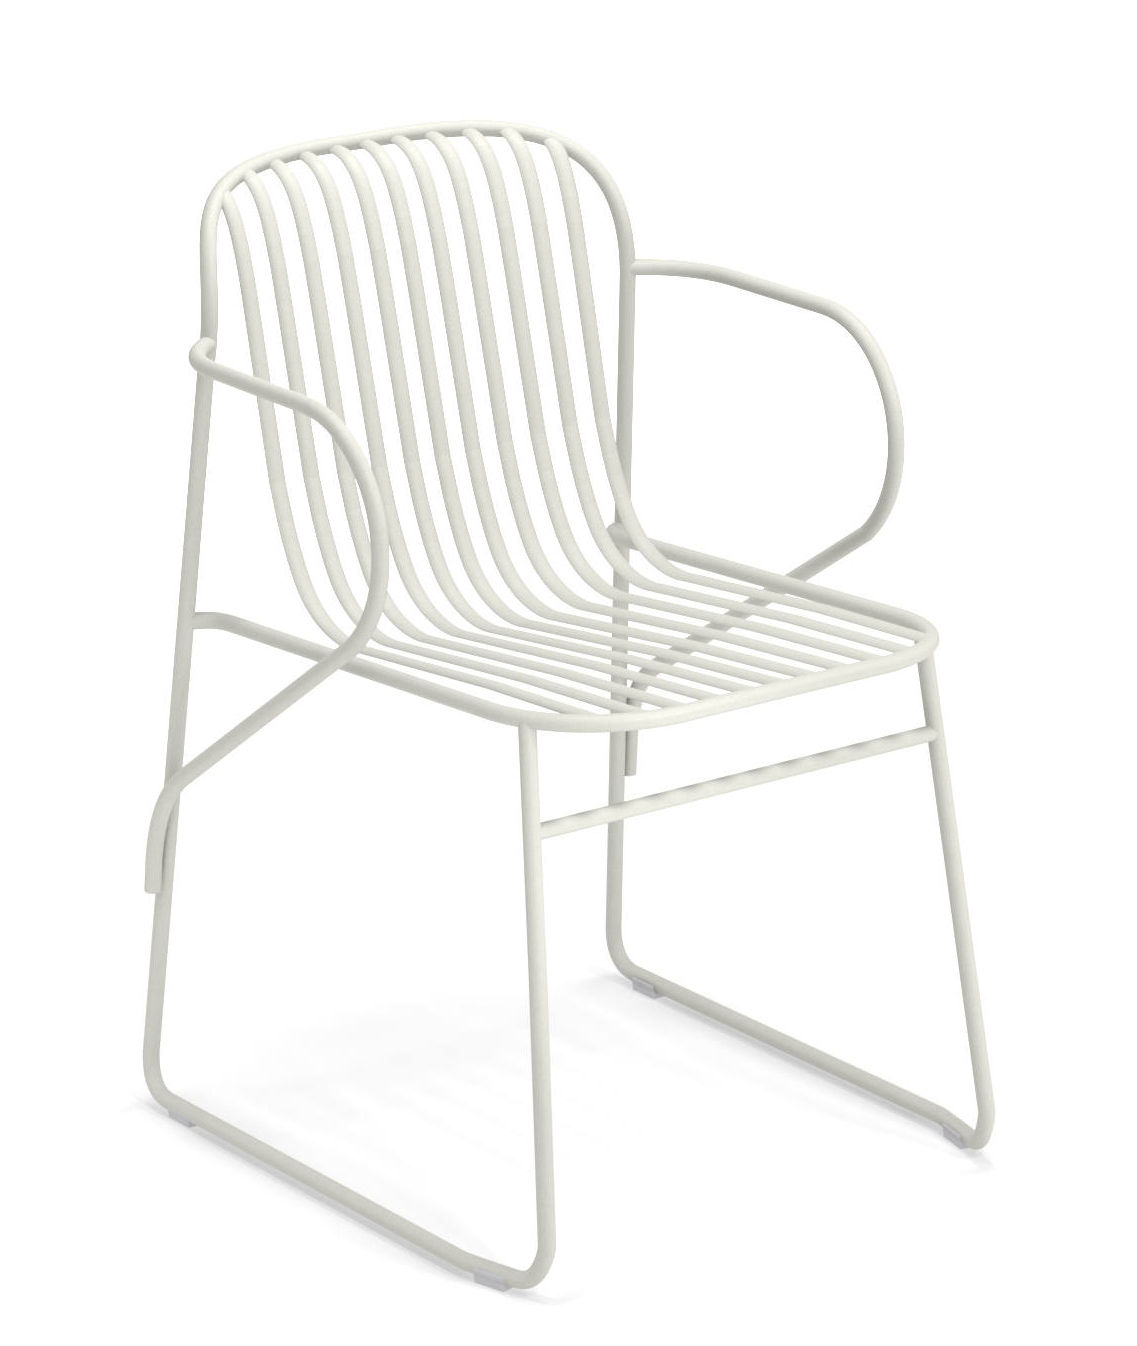 Möbel - Stühle  - Riviera Stapelbarer Sessel / Metall - Emu - Weiß - gefirnister Stahl